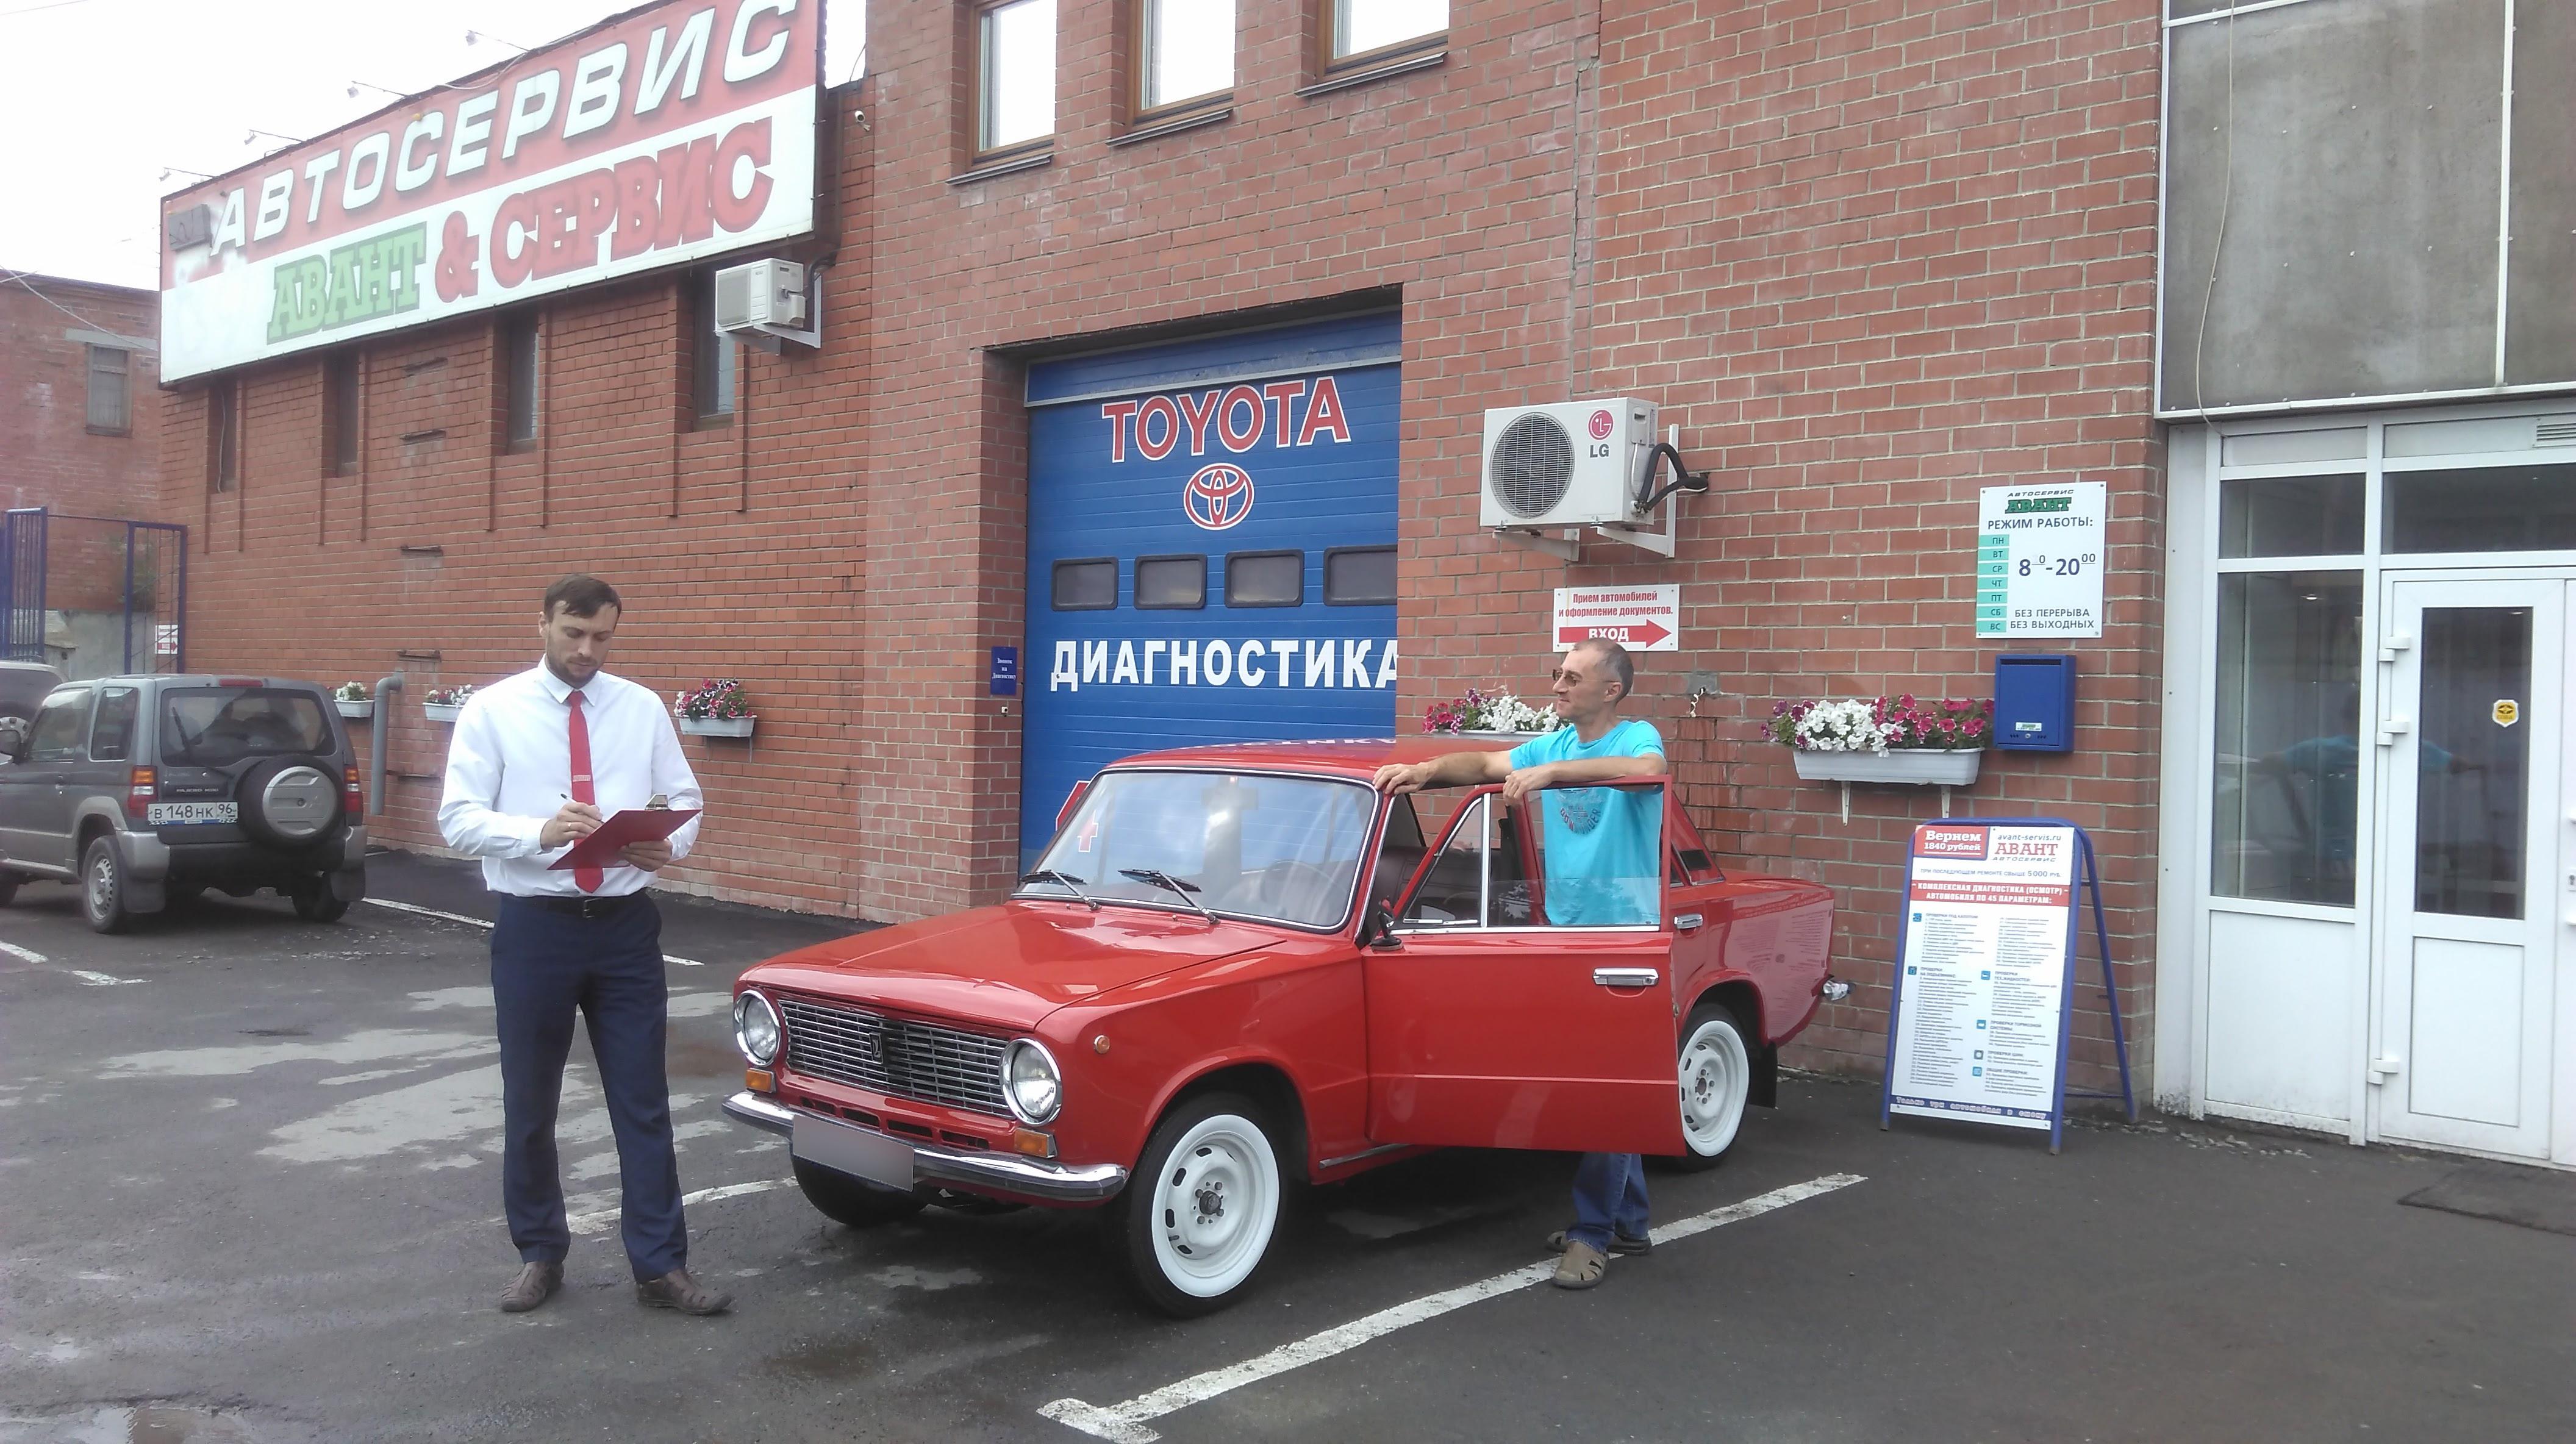 проверка авто перед покупкой: внешний осмотр